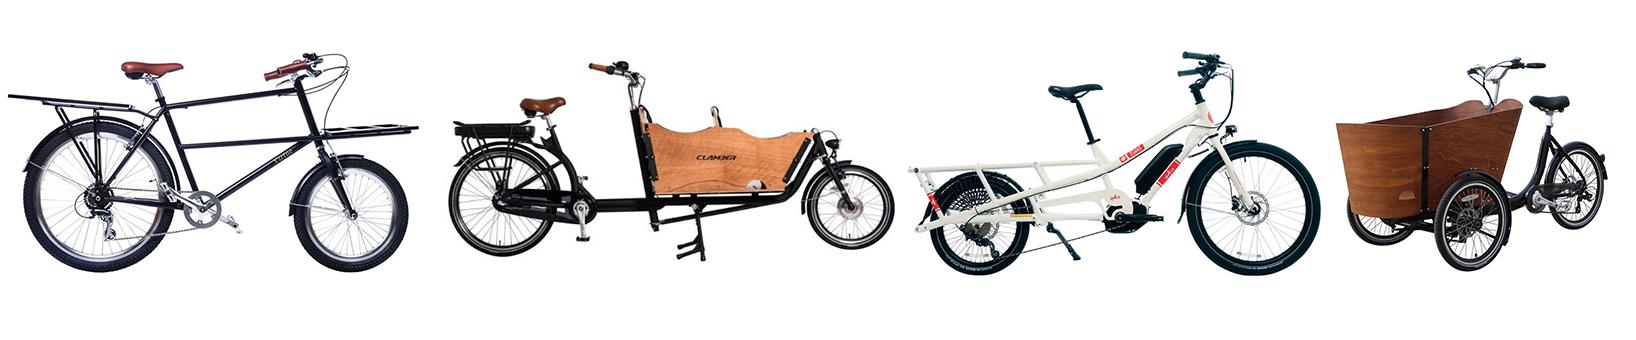 different types of cargo bikes